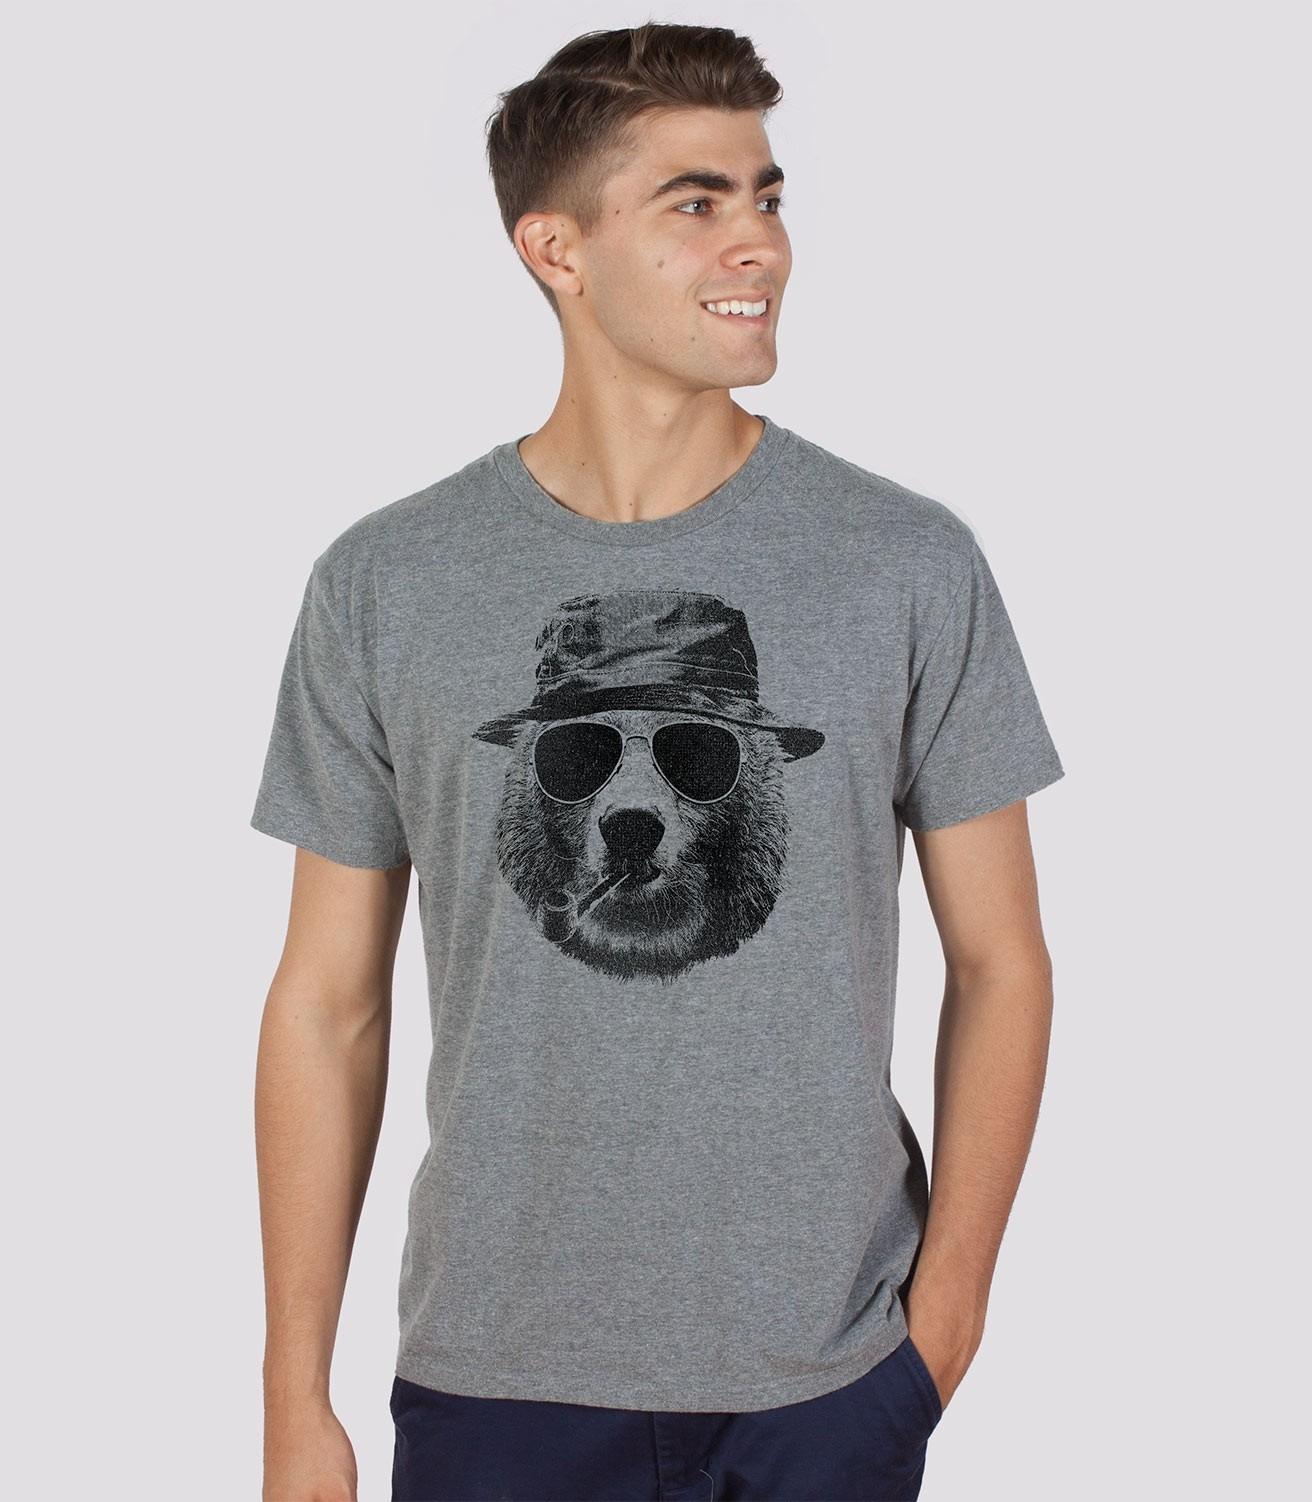 5169b44a2d Leisure Bear Men's Funny Camping T-Shirt | Headline Shirts